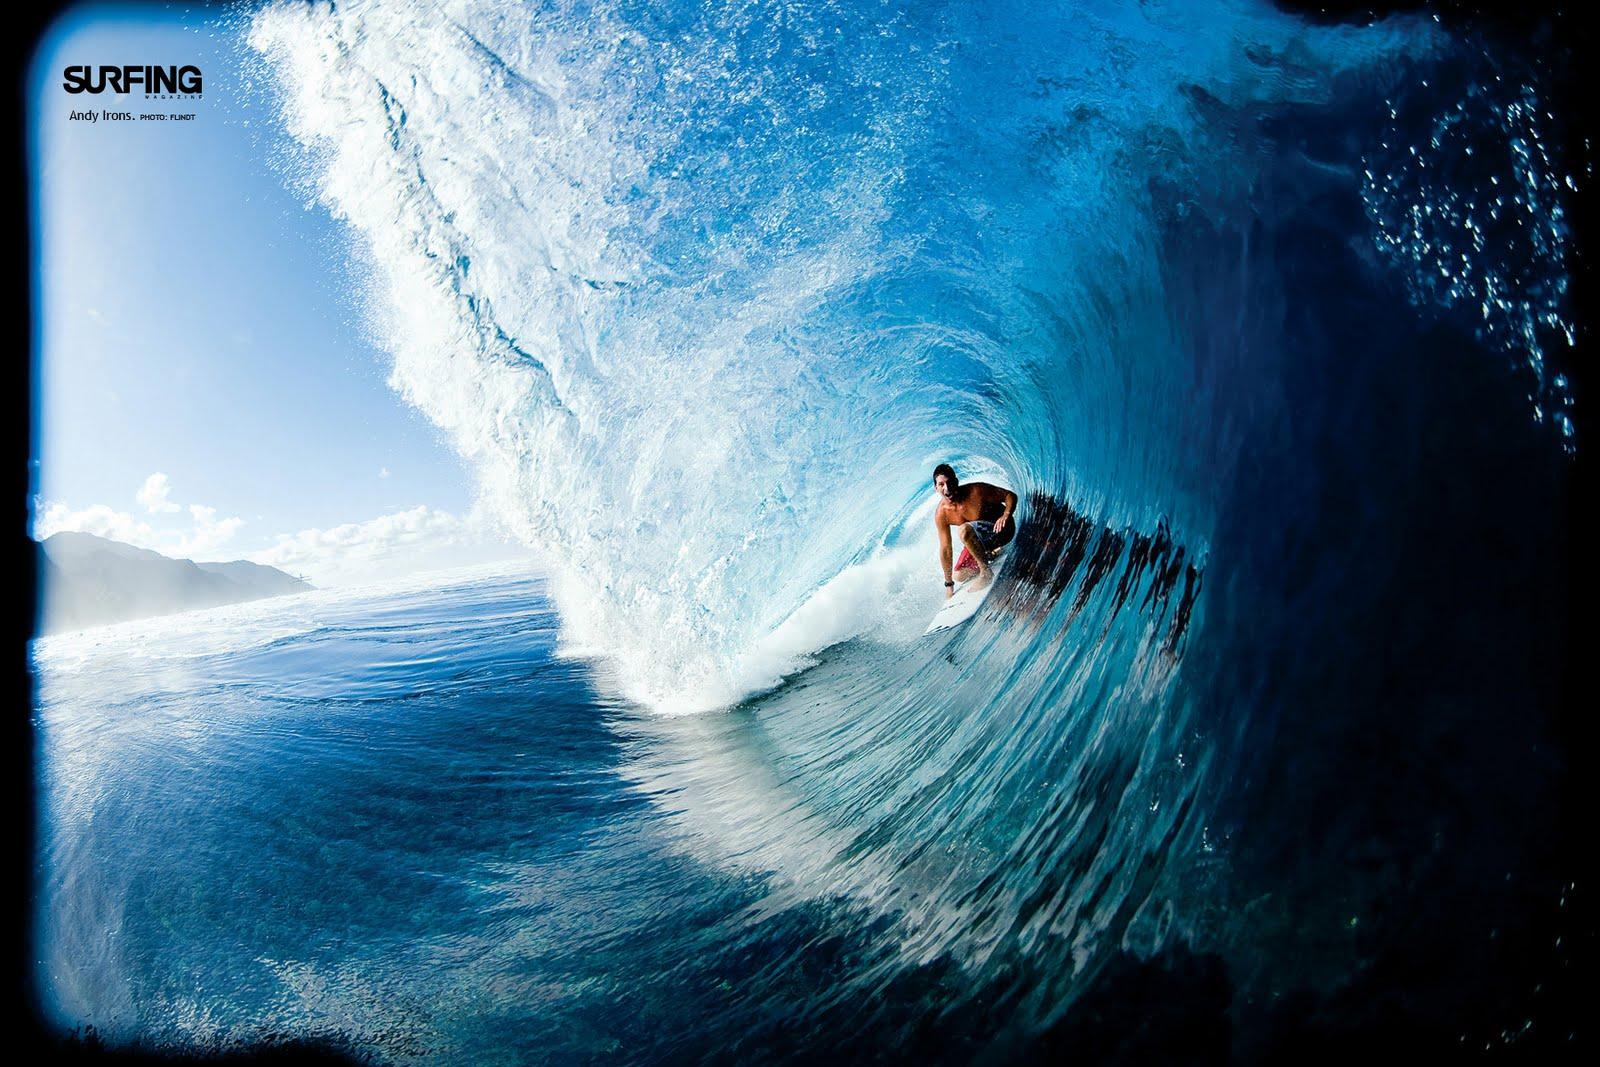 http://3.bp.blogspot.com/-HOdw_WgBwNc/TfDMf_XrJPI/AAAAAAAACNI/4XWFNeIY-To/s1600/andy-irons-surfing-wallpaper.jpg